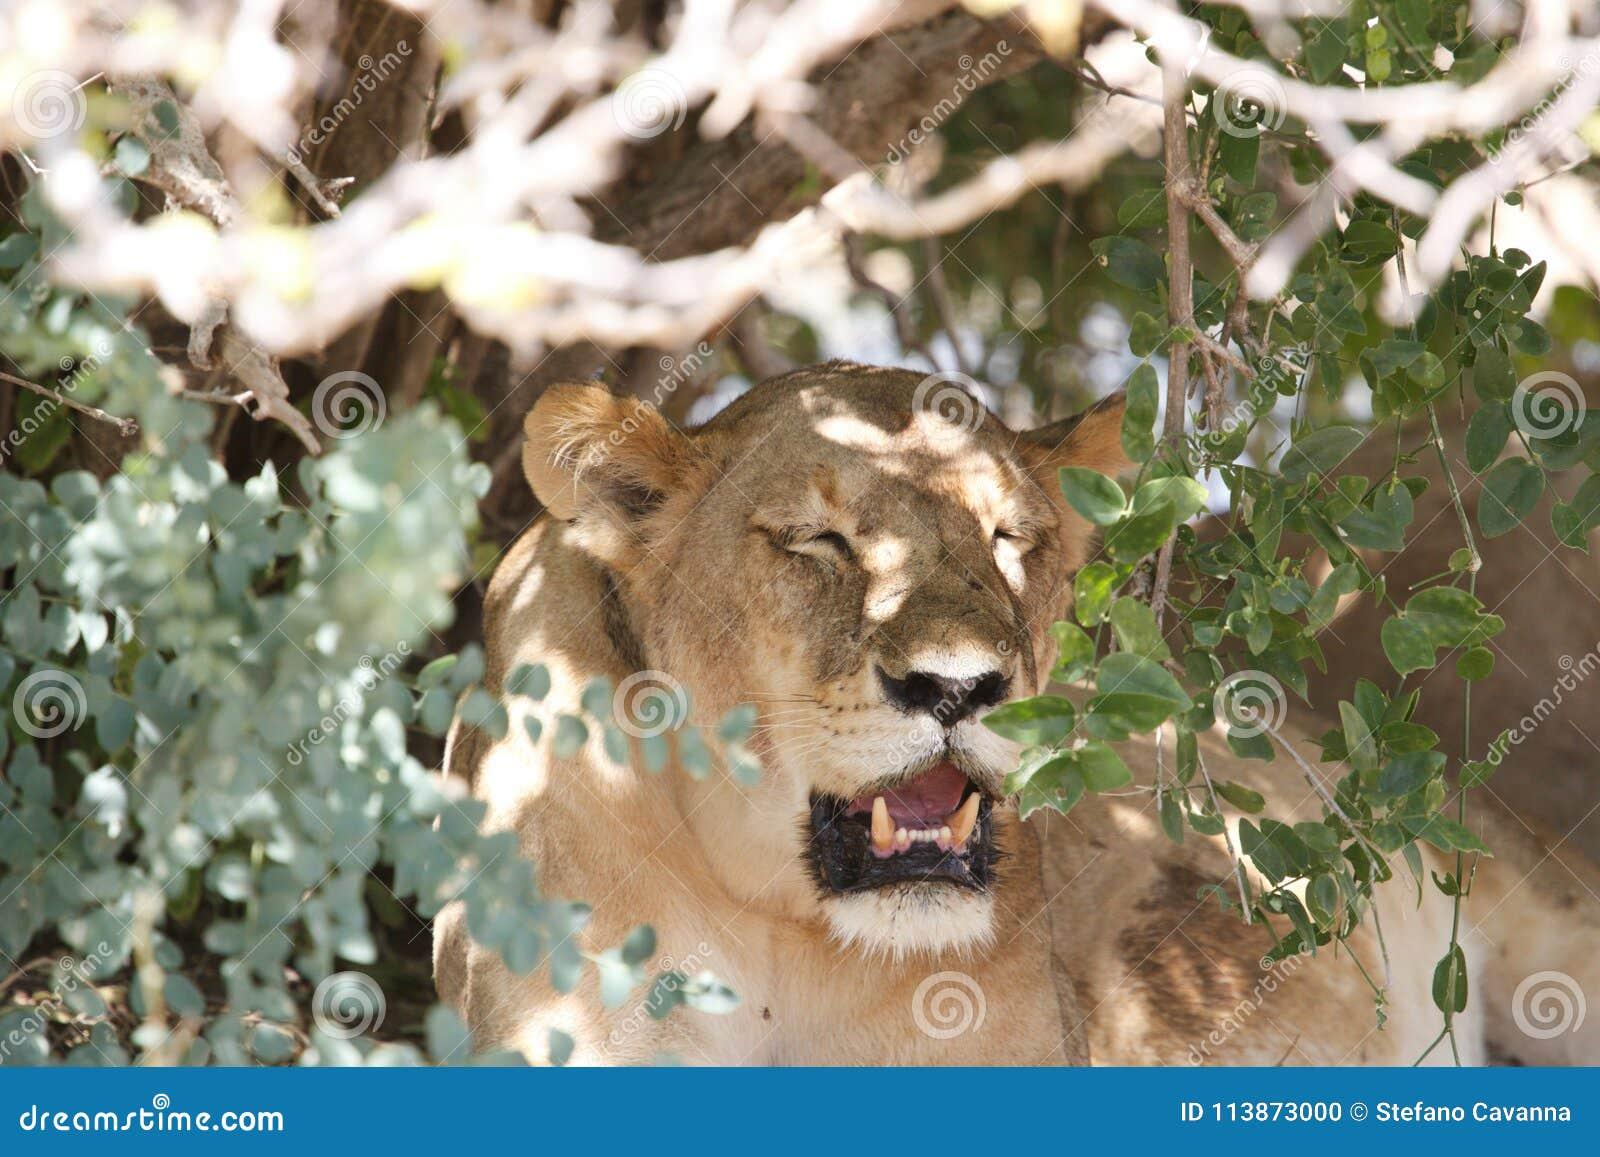 Lion in Ruaha National Park, Tanzania